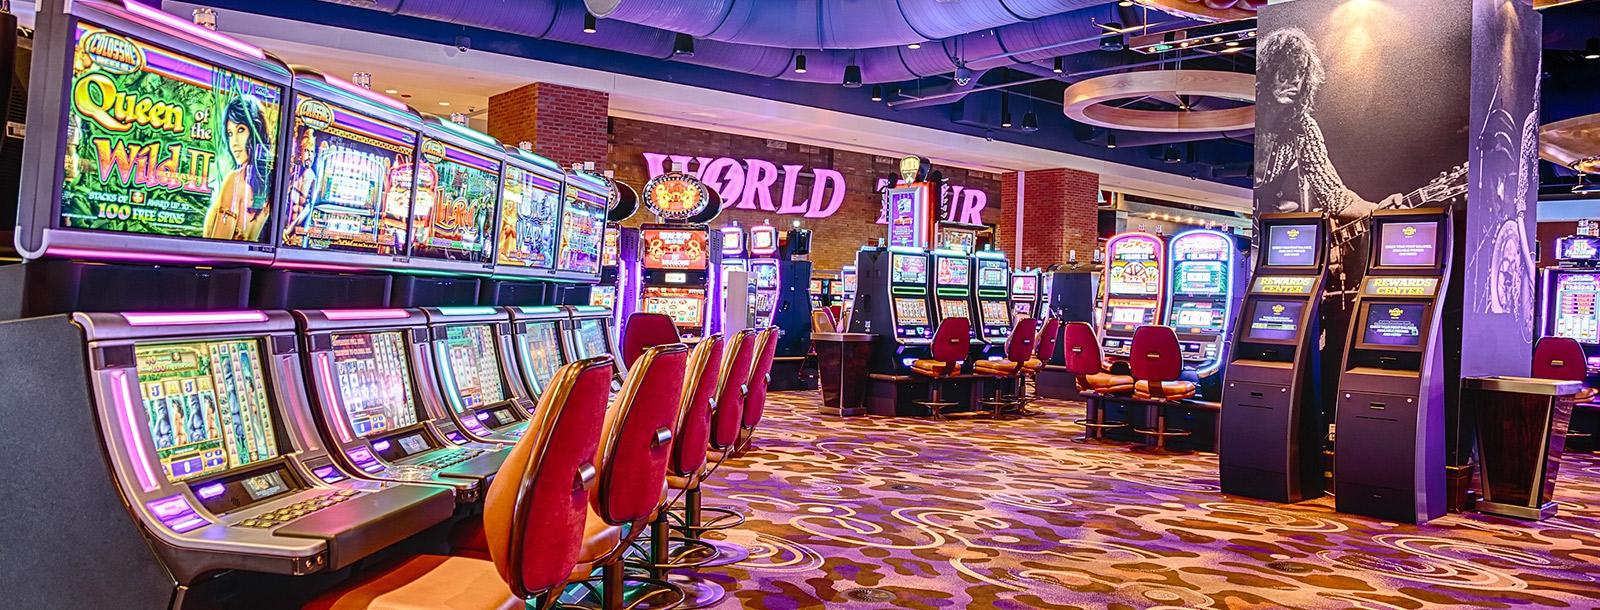 hard rock sioux city casino